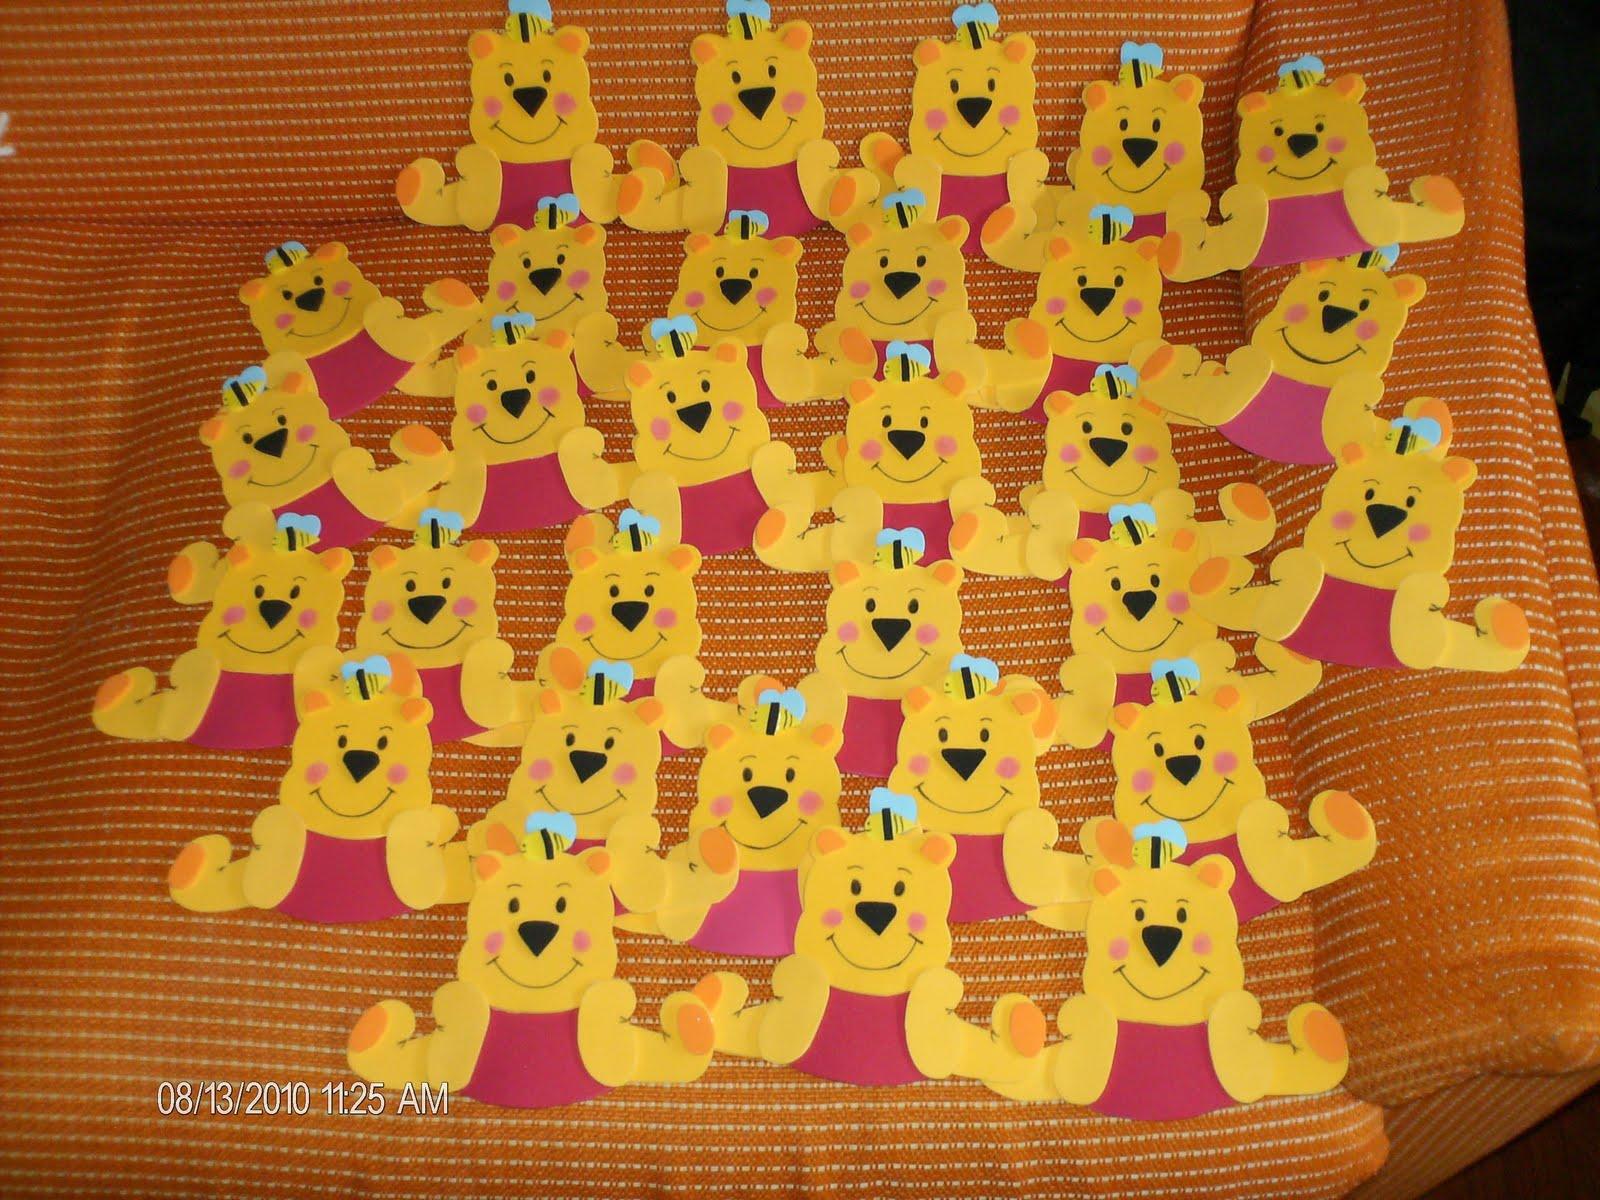 Pin Decoracao Ursinho Pooh Pelautscom on Pinterest